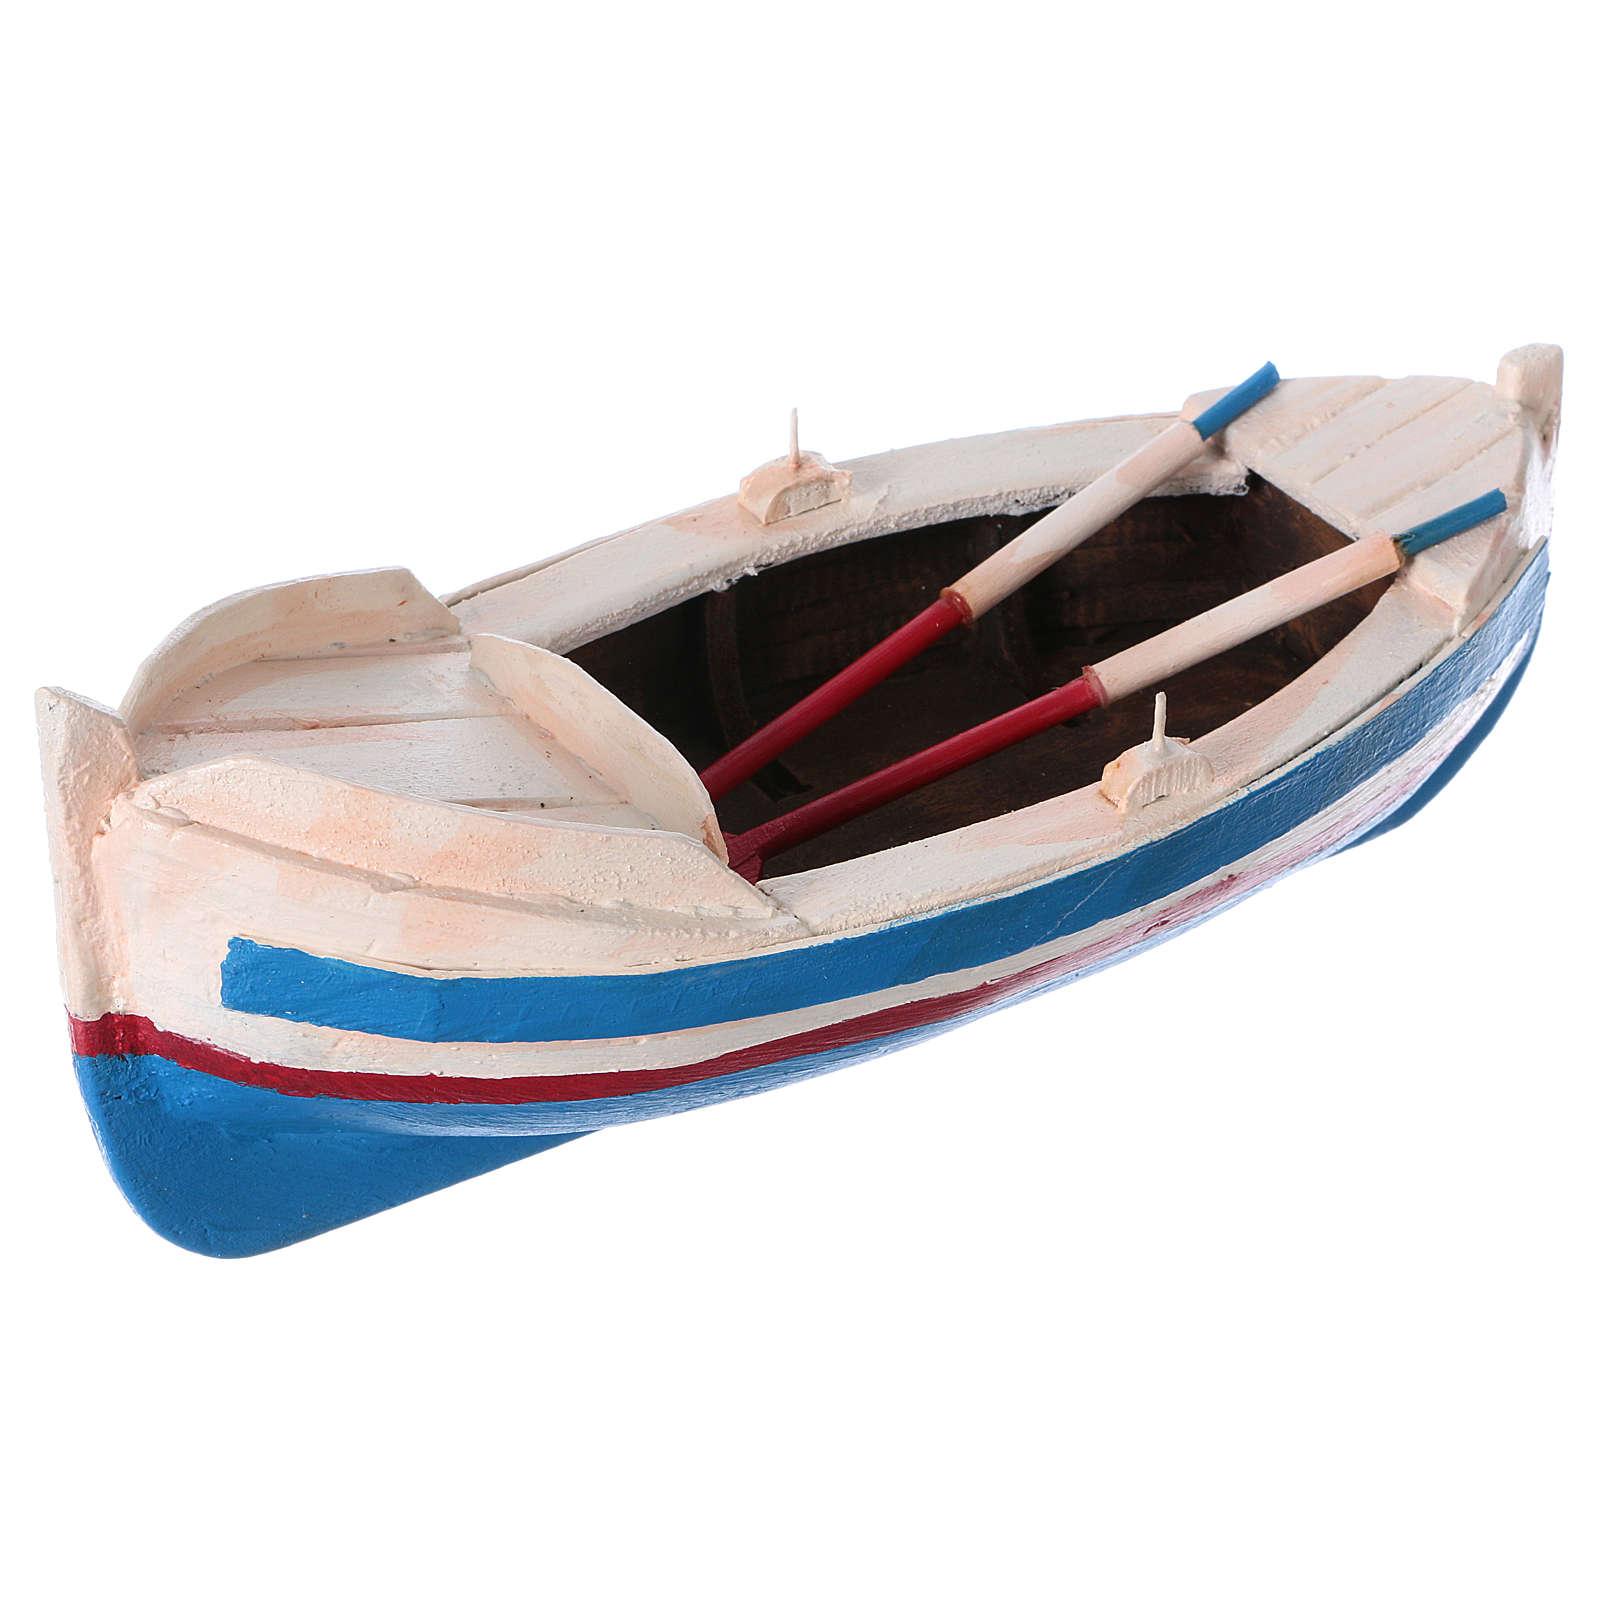 Small boat for Nativity Scene 10 cm 4